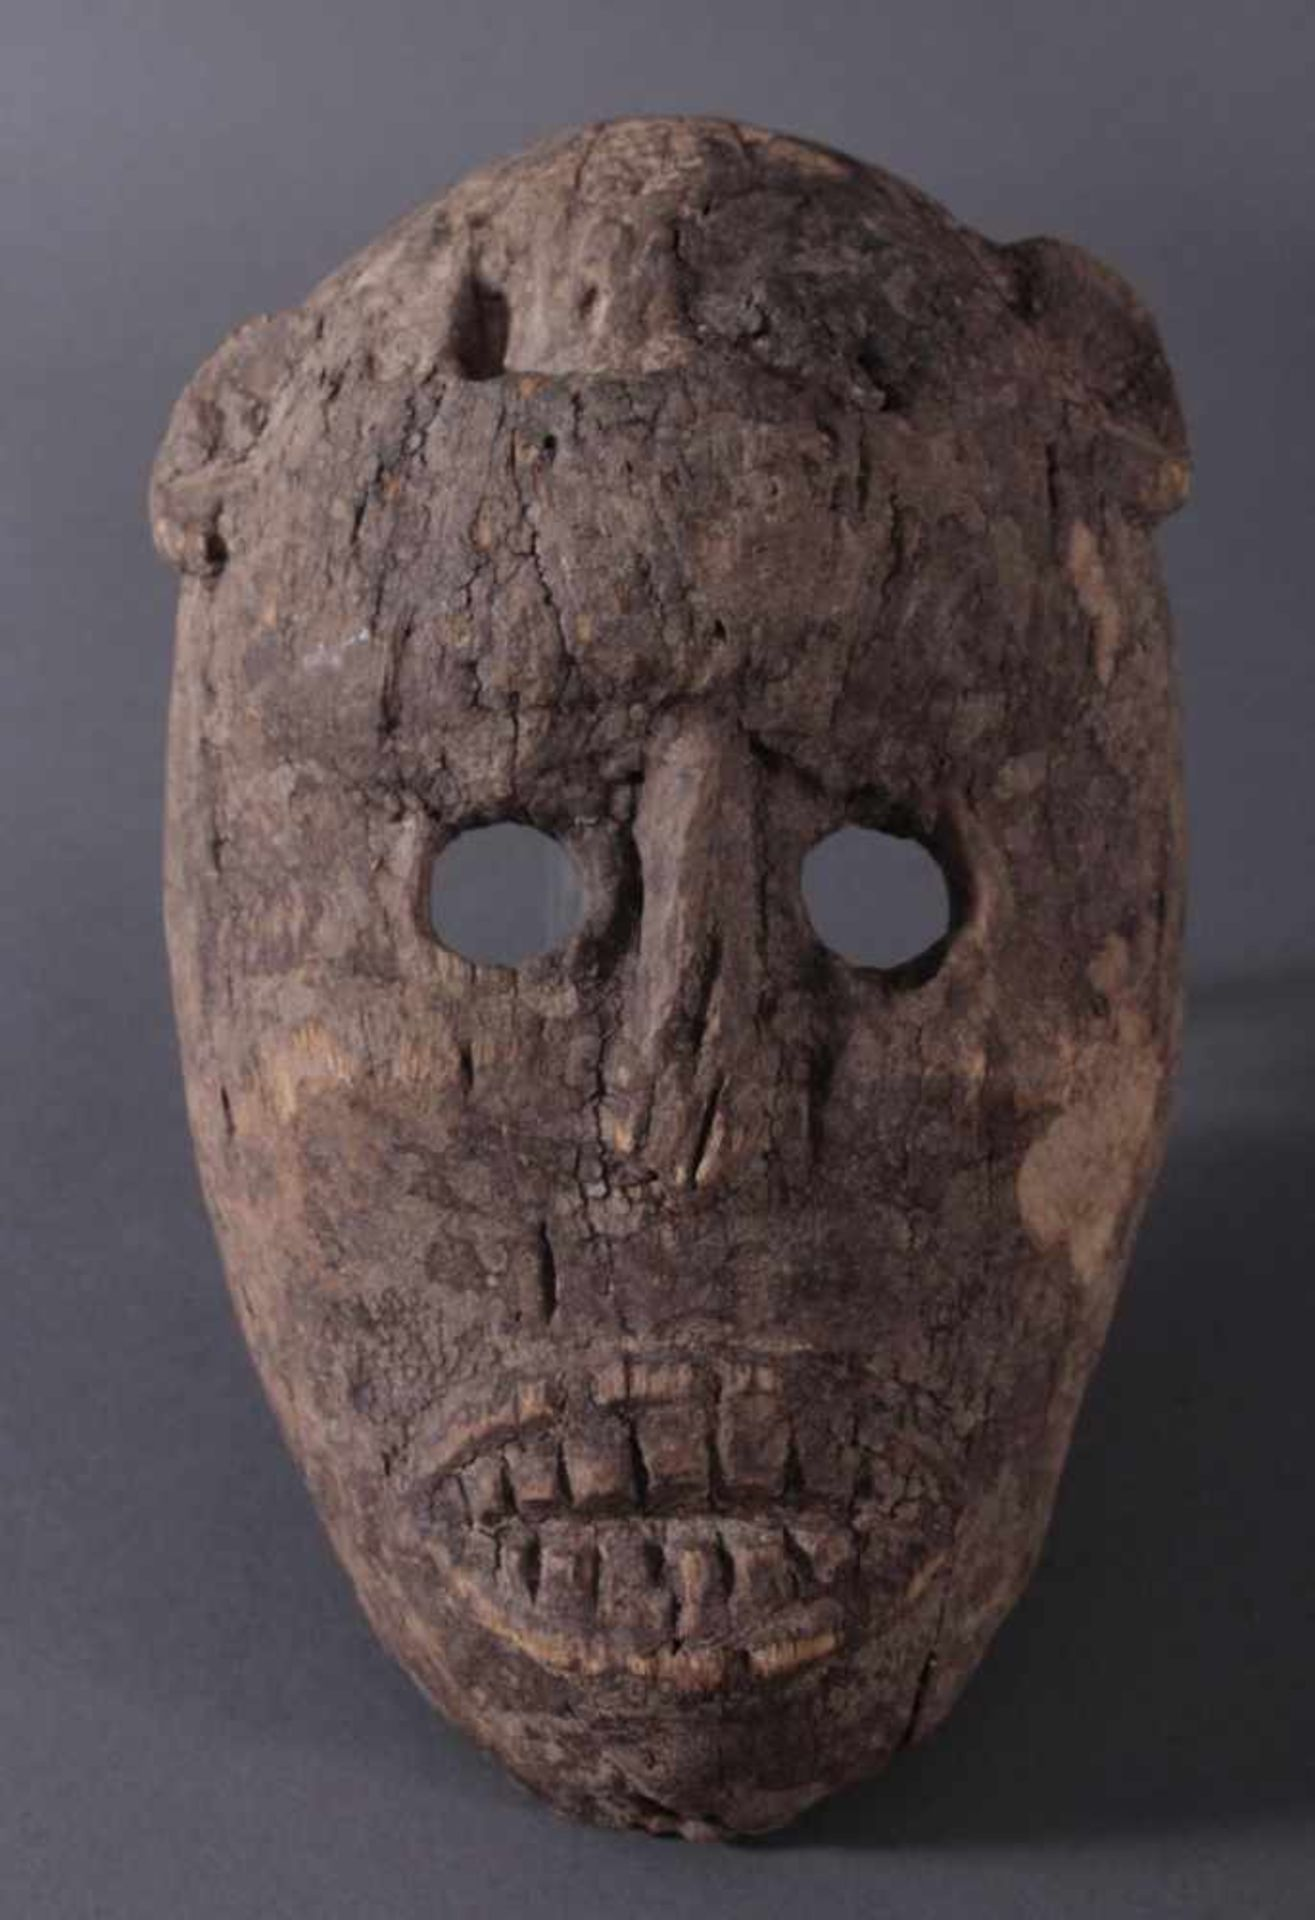 Antike Zoomorphe Maske, Makua, Tansania 1. Hälfte 20. Jh.Hartholzolz, alter Wurmfrass, dunkle Patina